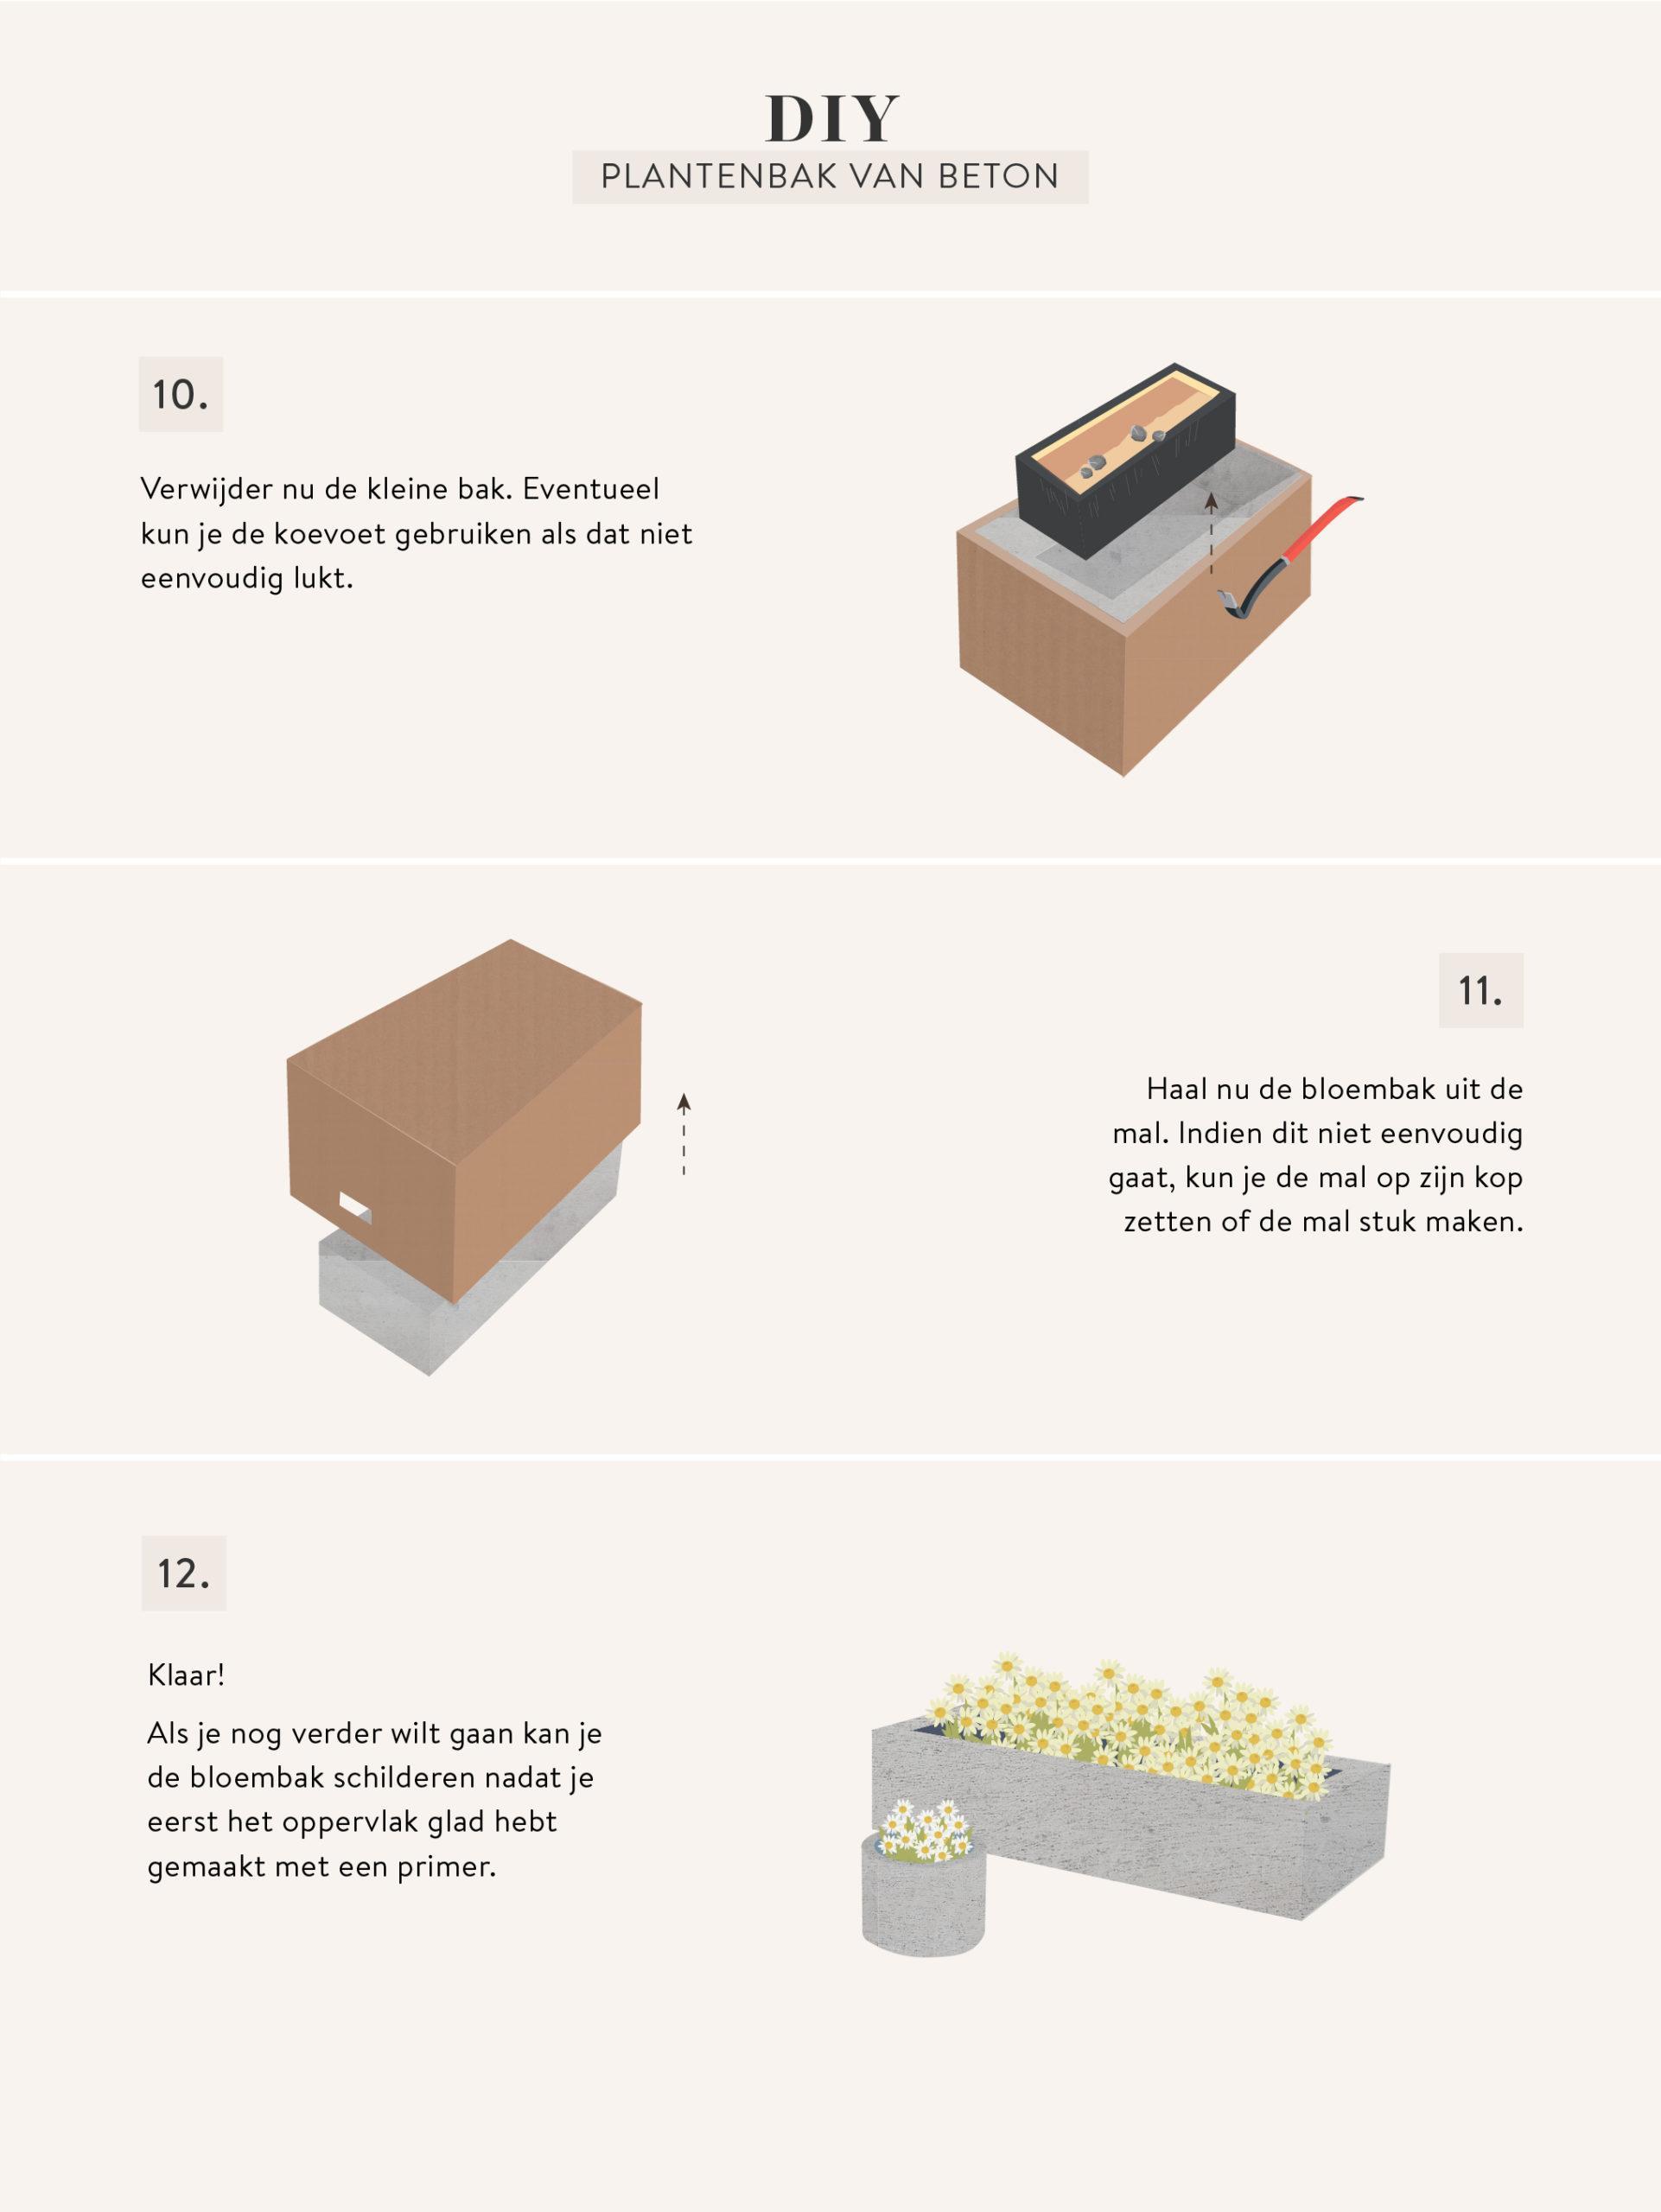 stappenplan plantenbak van beton maken